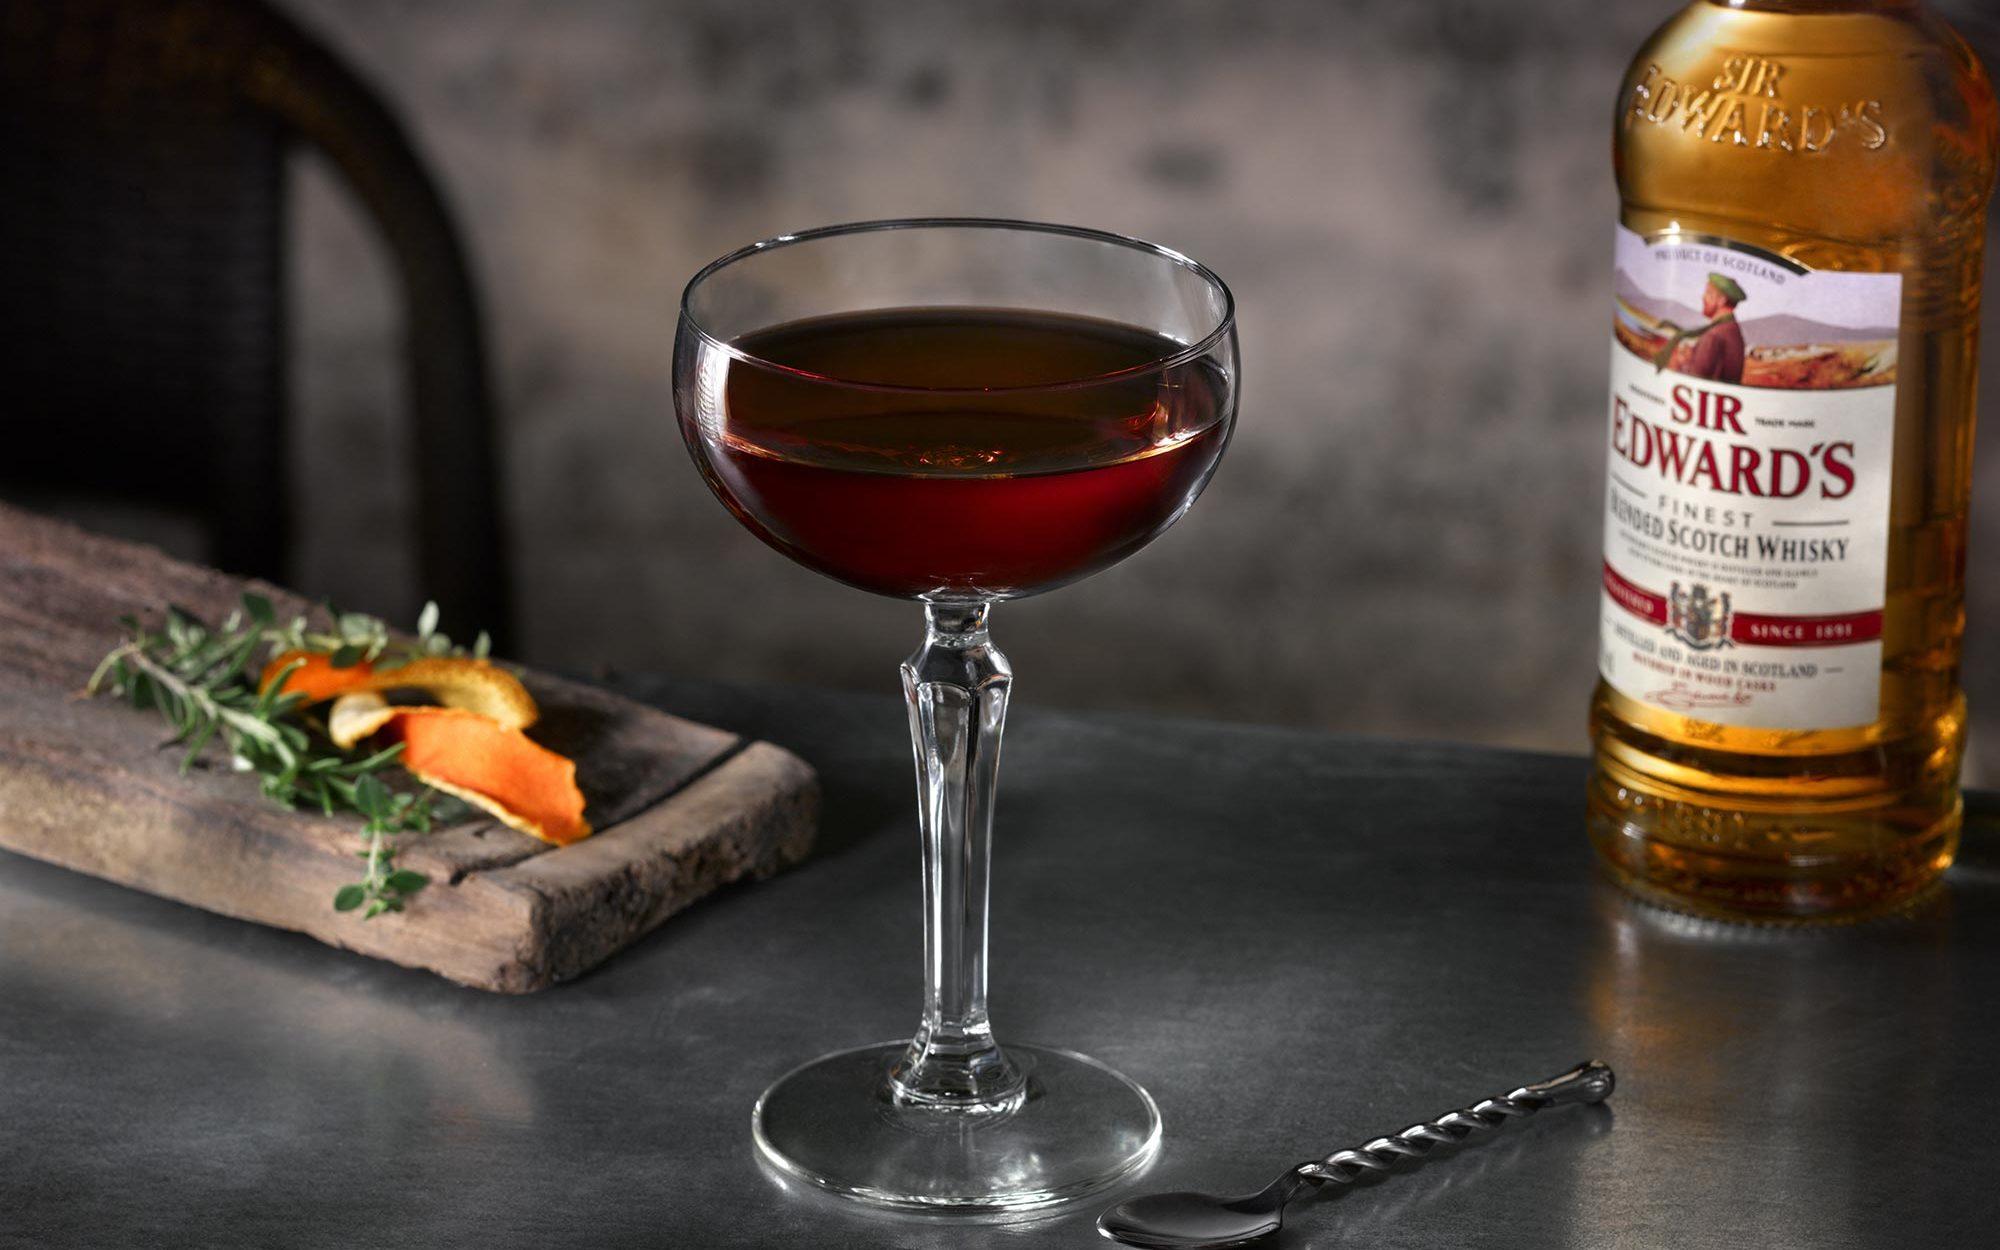 Sir Edwards Rob Boy Cocktail